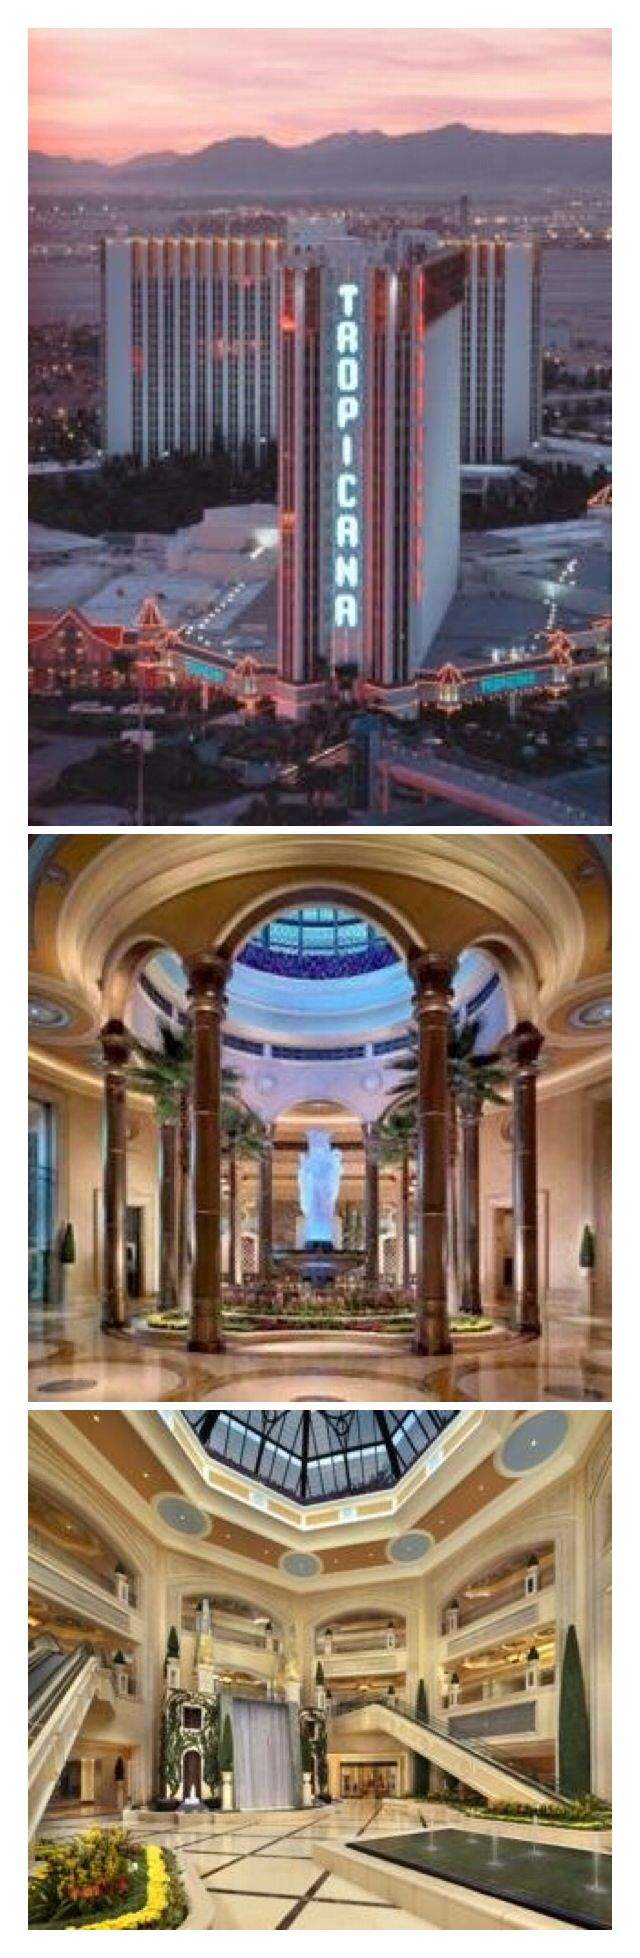 :The Tropicana Hotel/Casino - Las Vegas Nevada